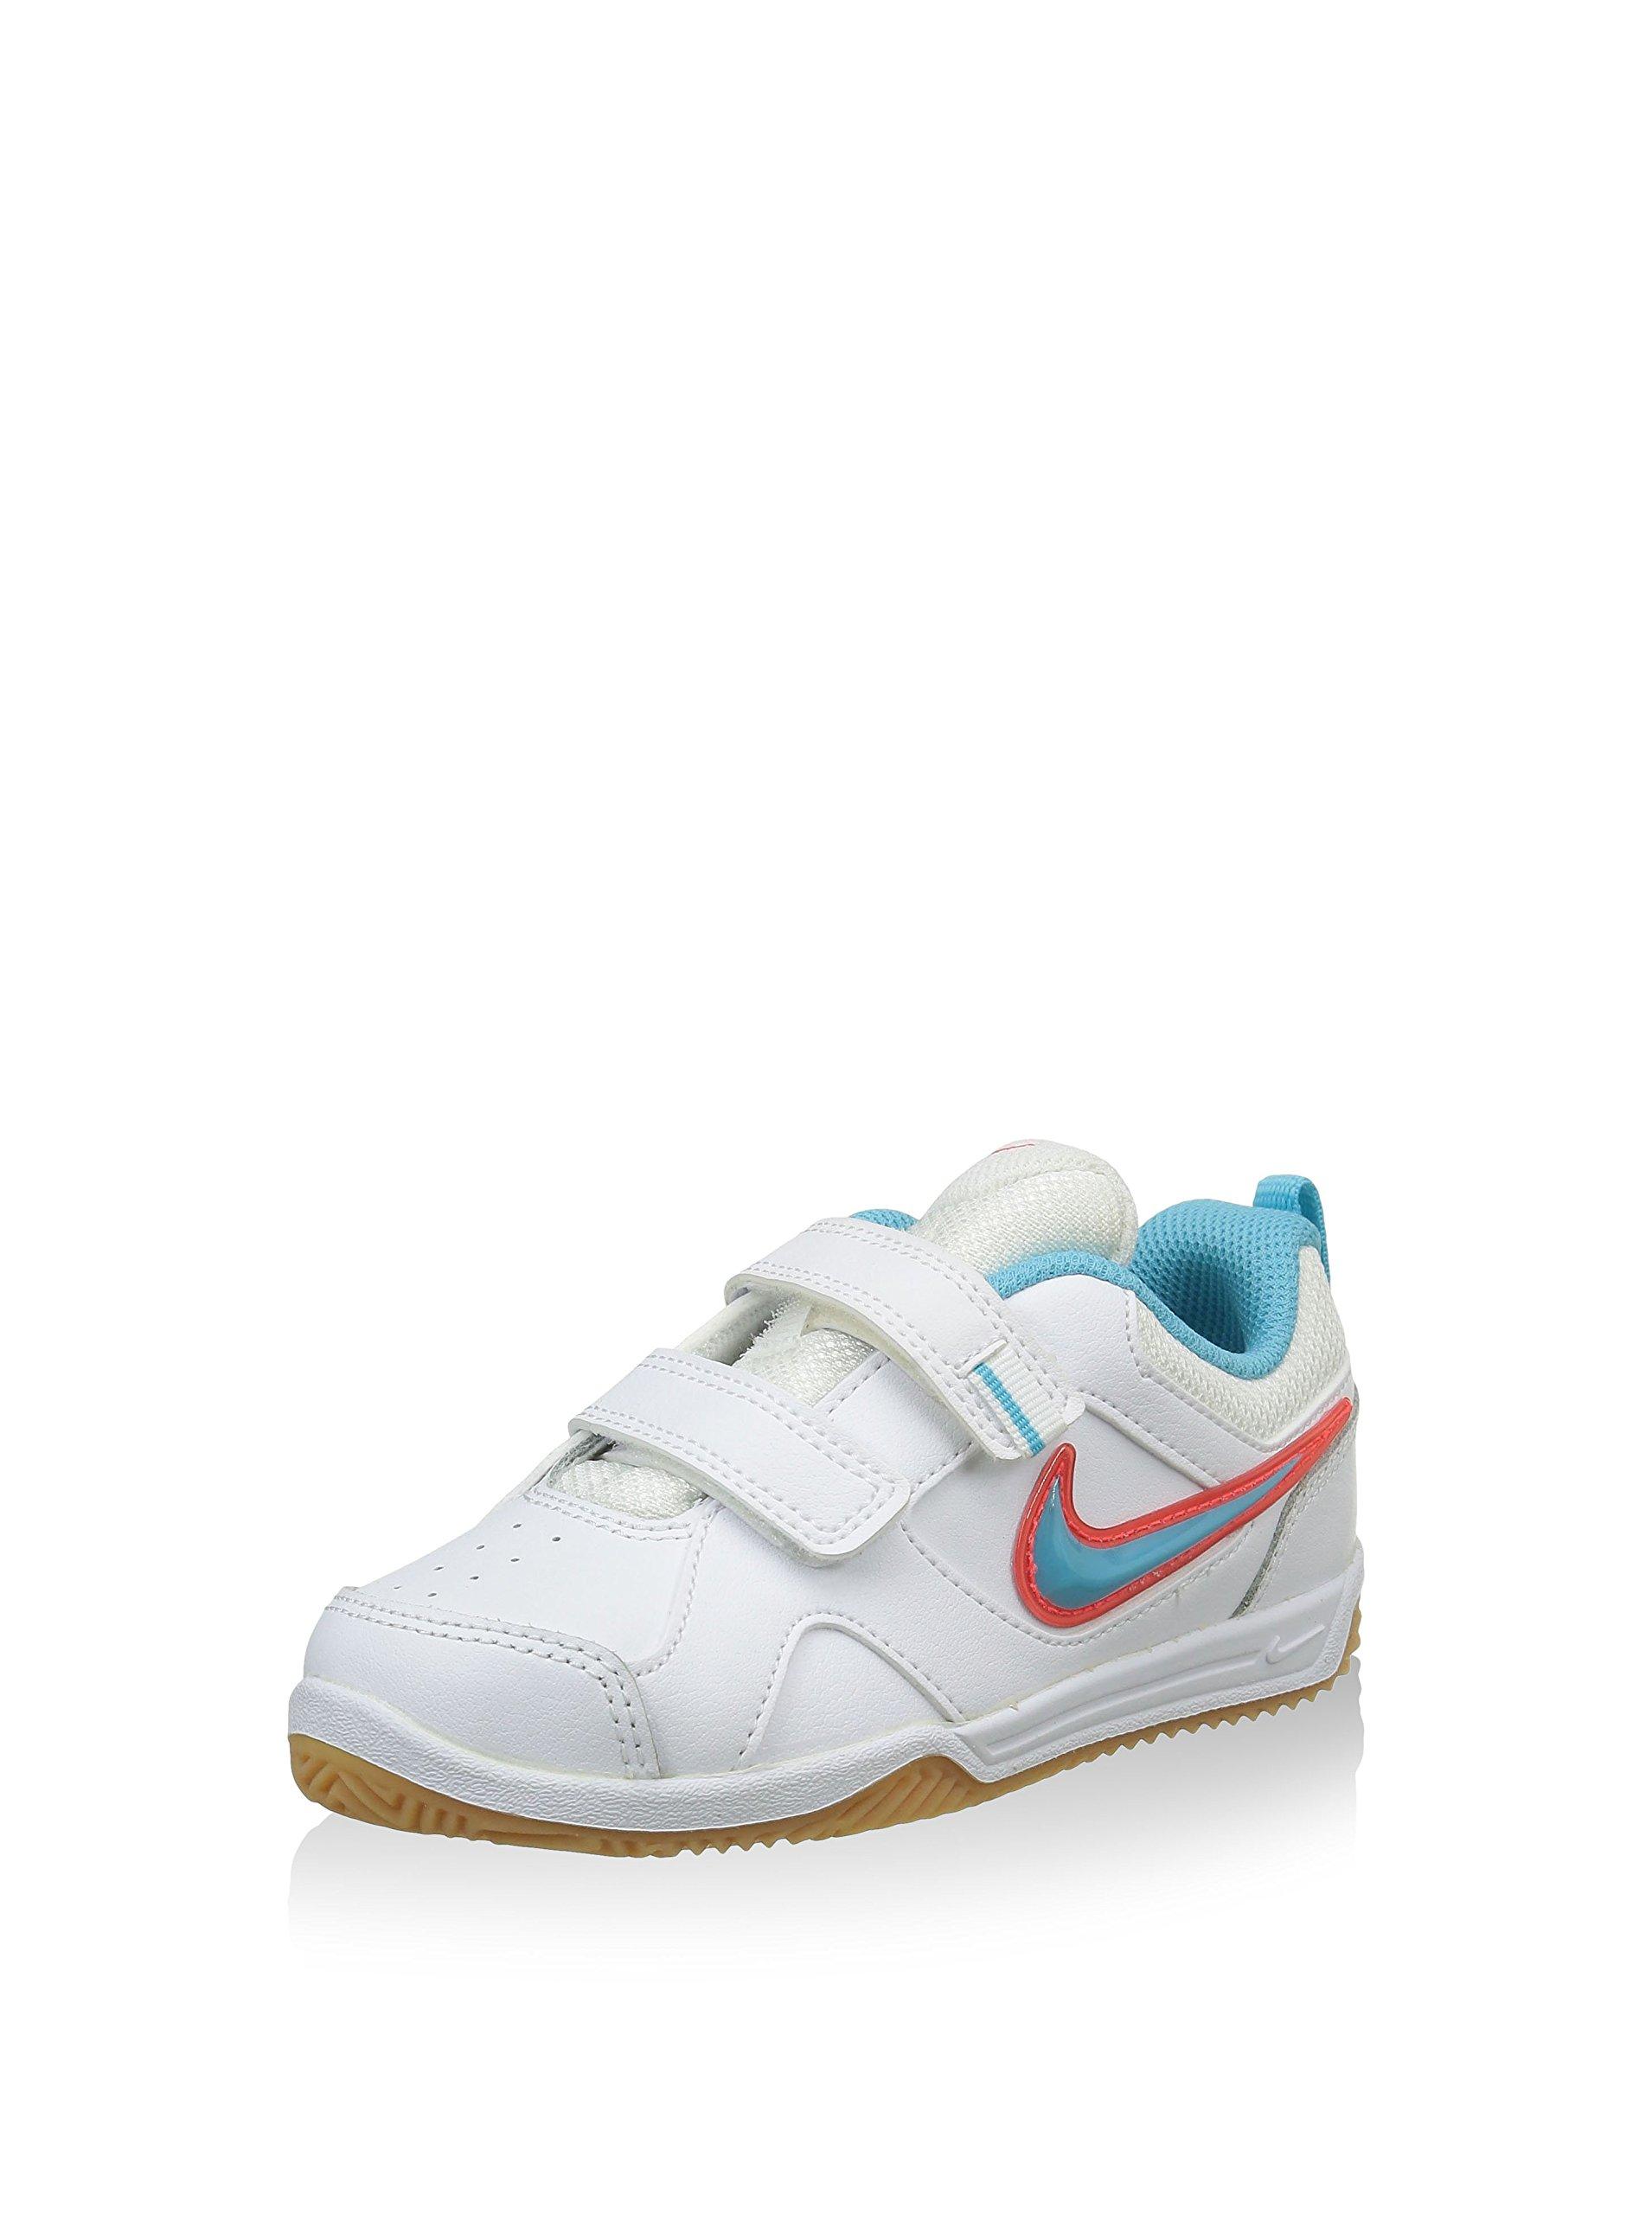 Nike - Lykin 11 - Color: Azzuro-Bianco - Size: 21.0